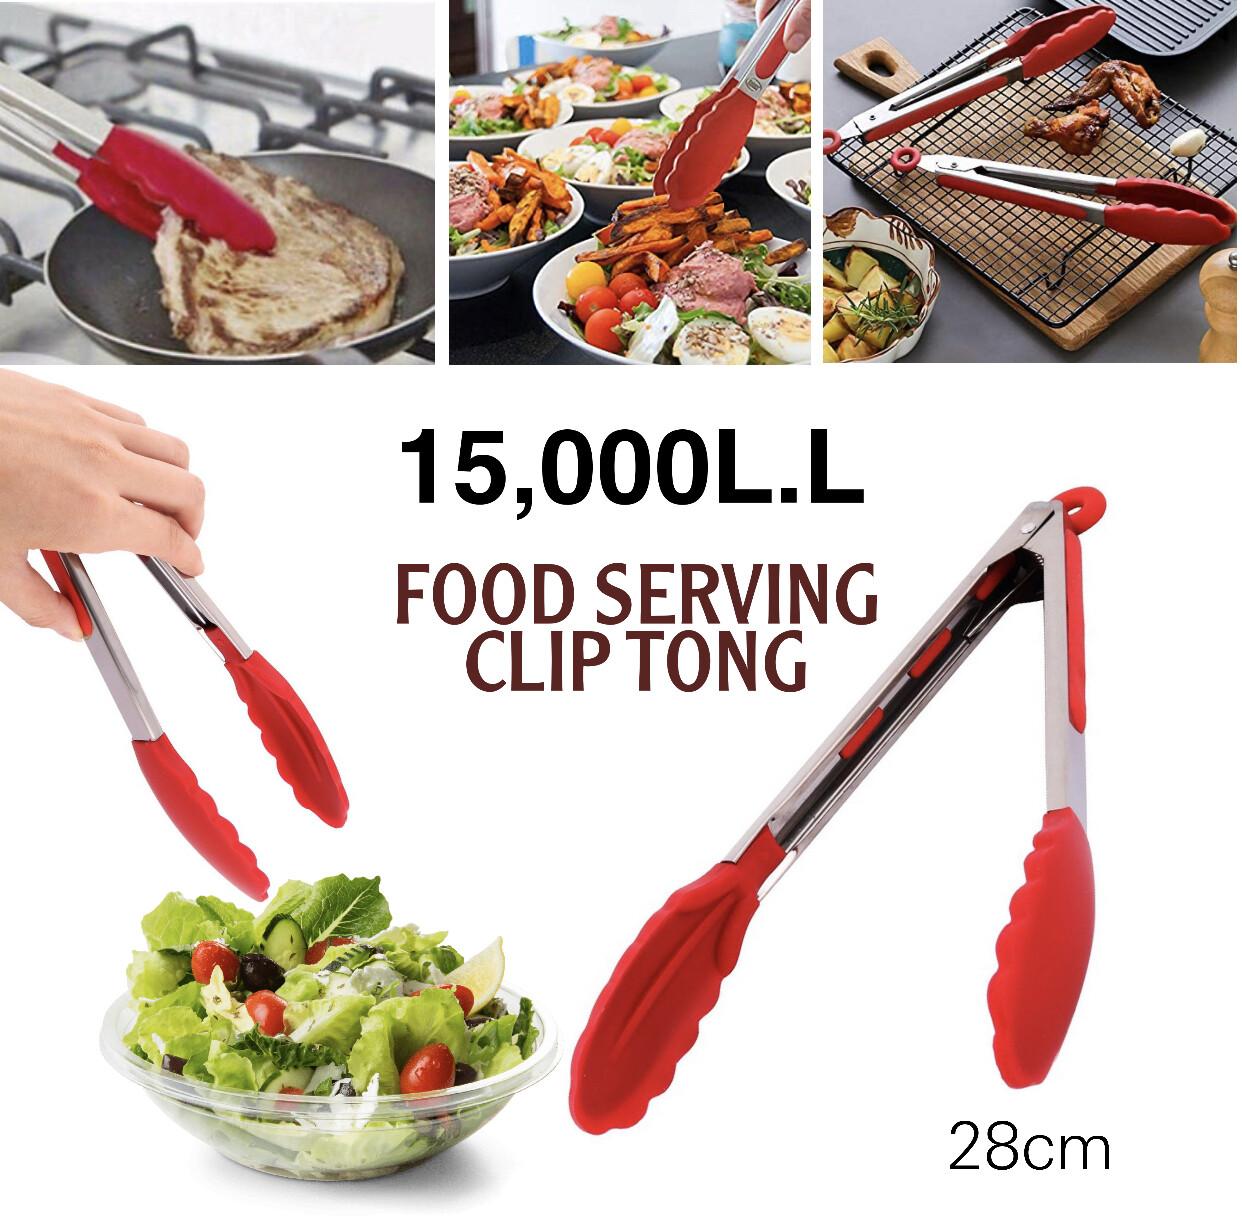 Food Clip Tong